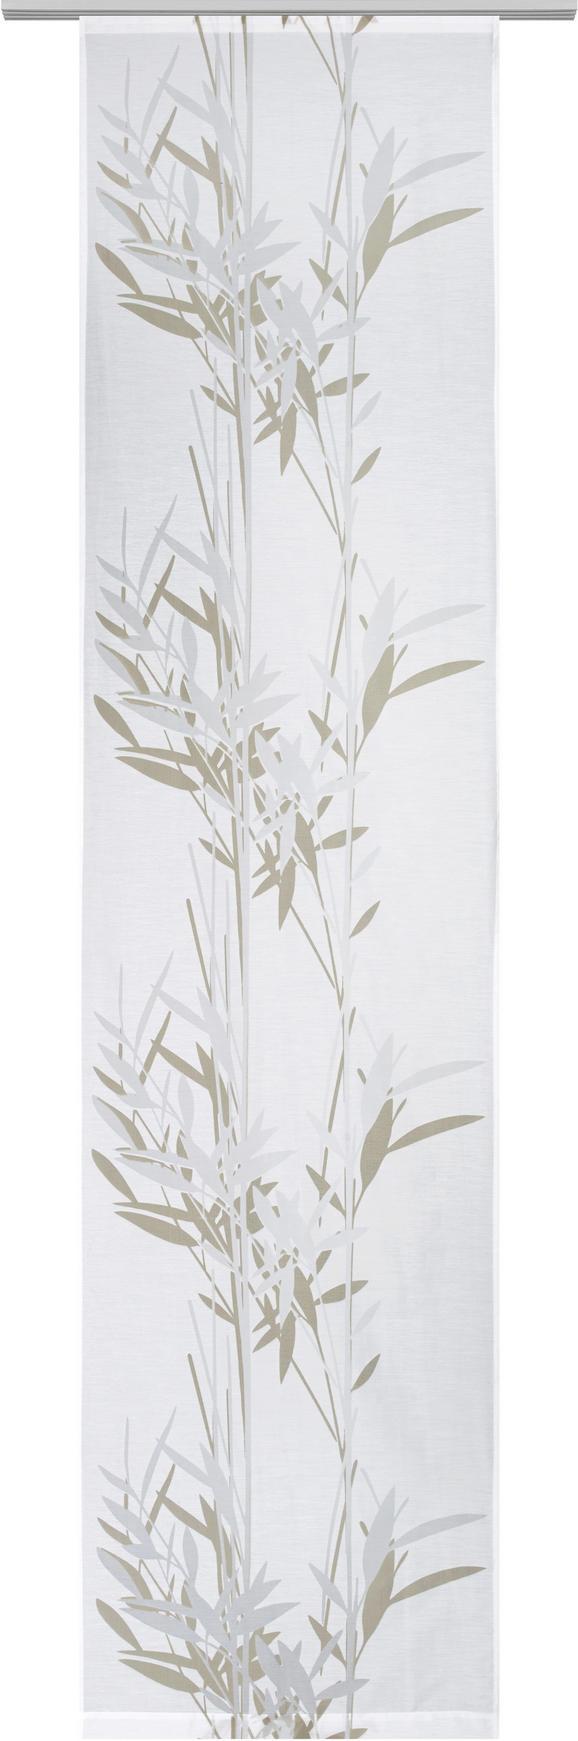 Panelna Zavesa Gräser - bela, Moderno, tekstil (60/245cm) - Mömax modern living